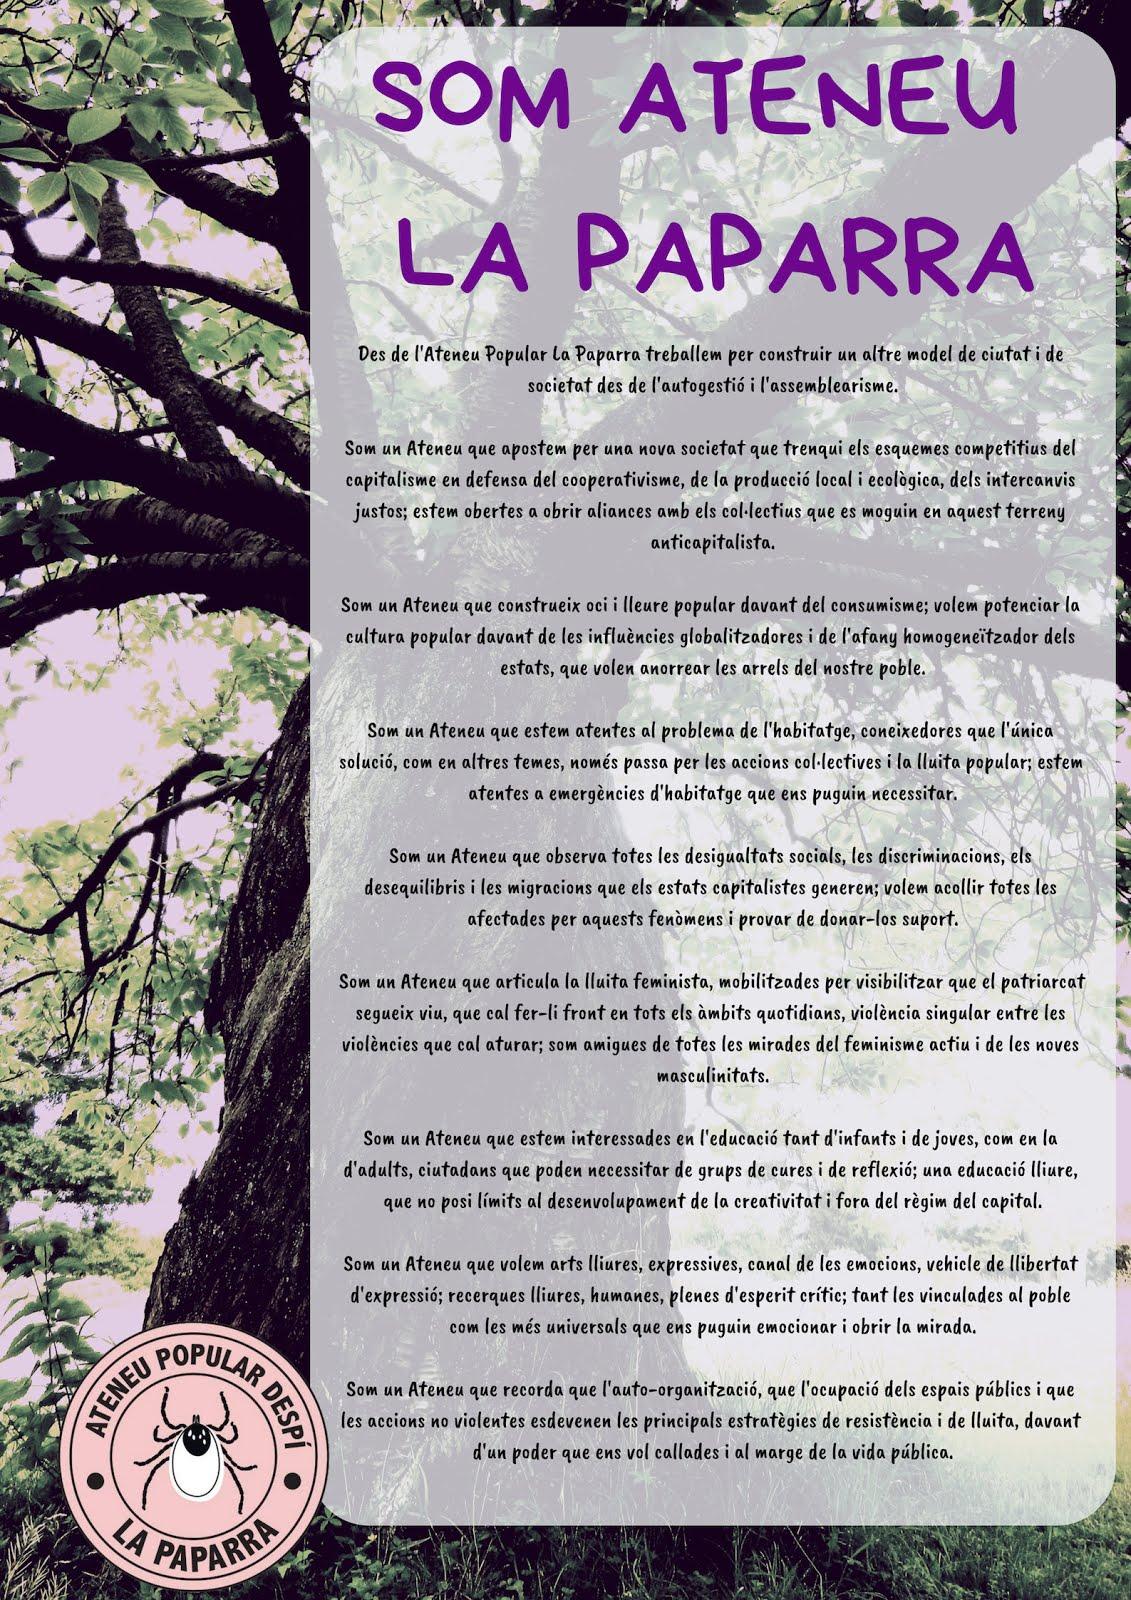 Som Ateneu La Paparra